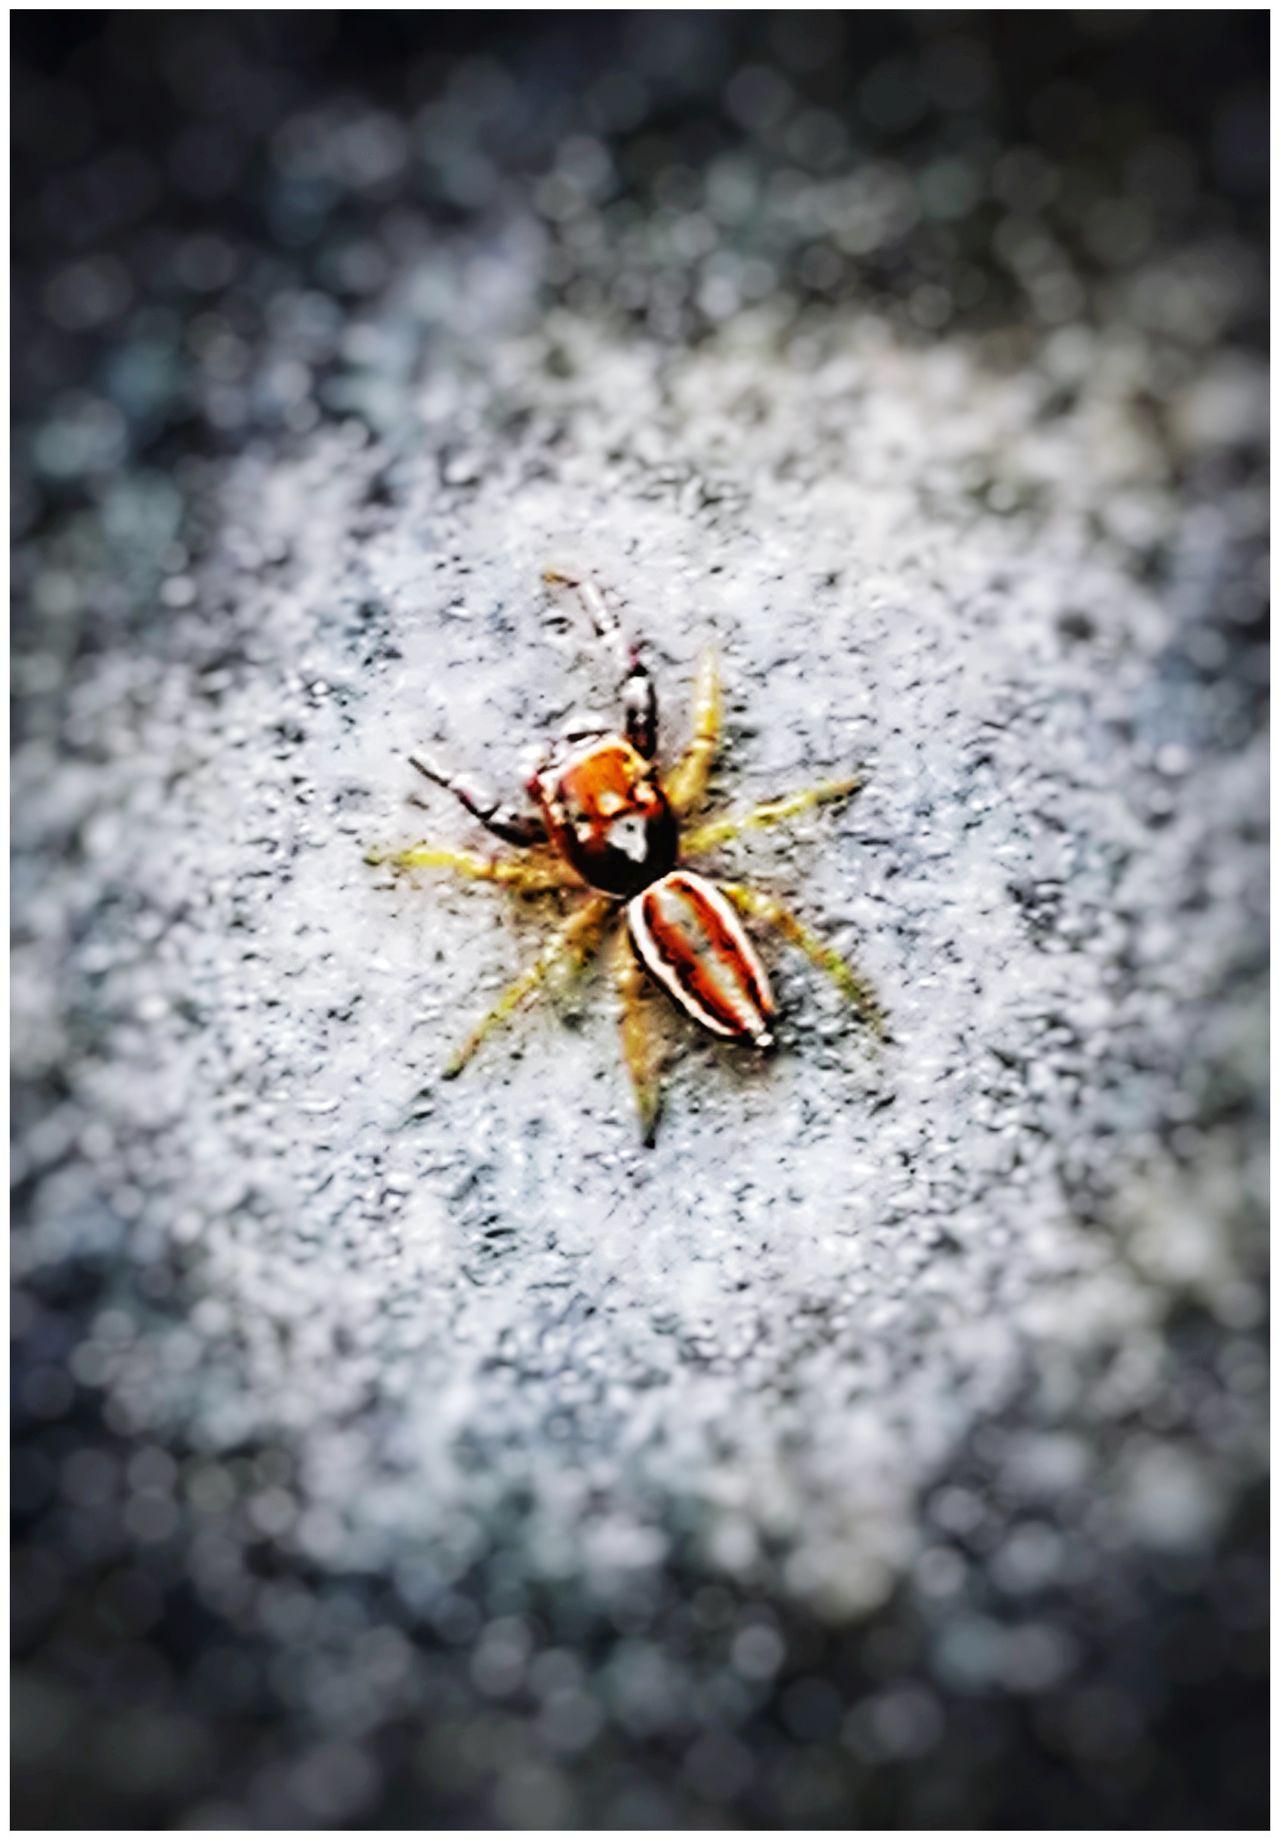 Animal Themes Animals In The Wild Insect Animal Wildlife Nature Spider Spiderweb Spiderworld